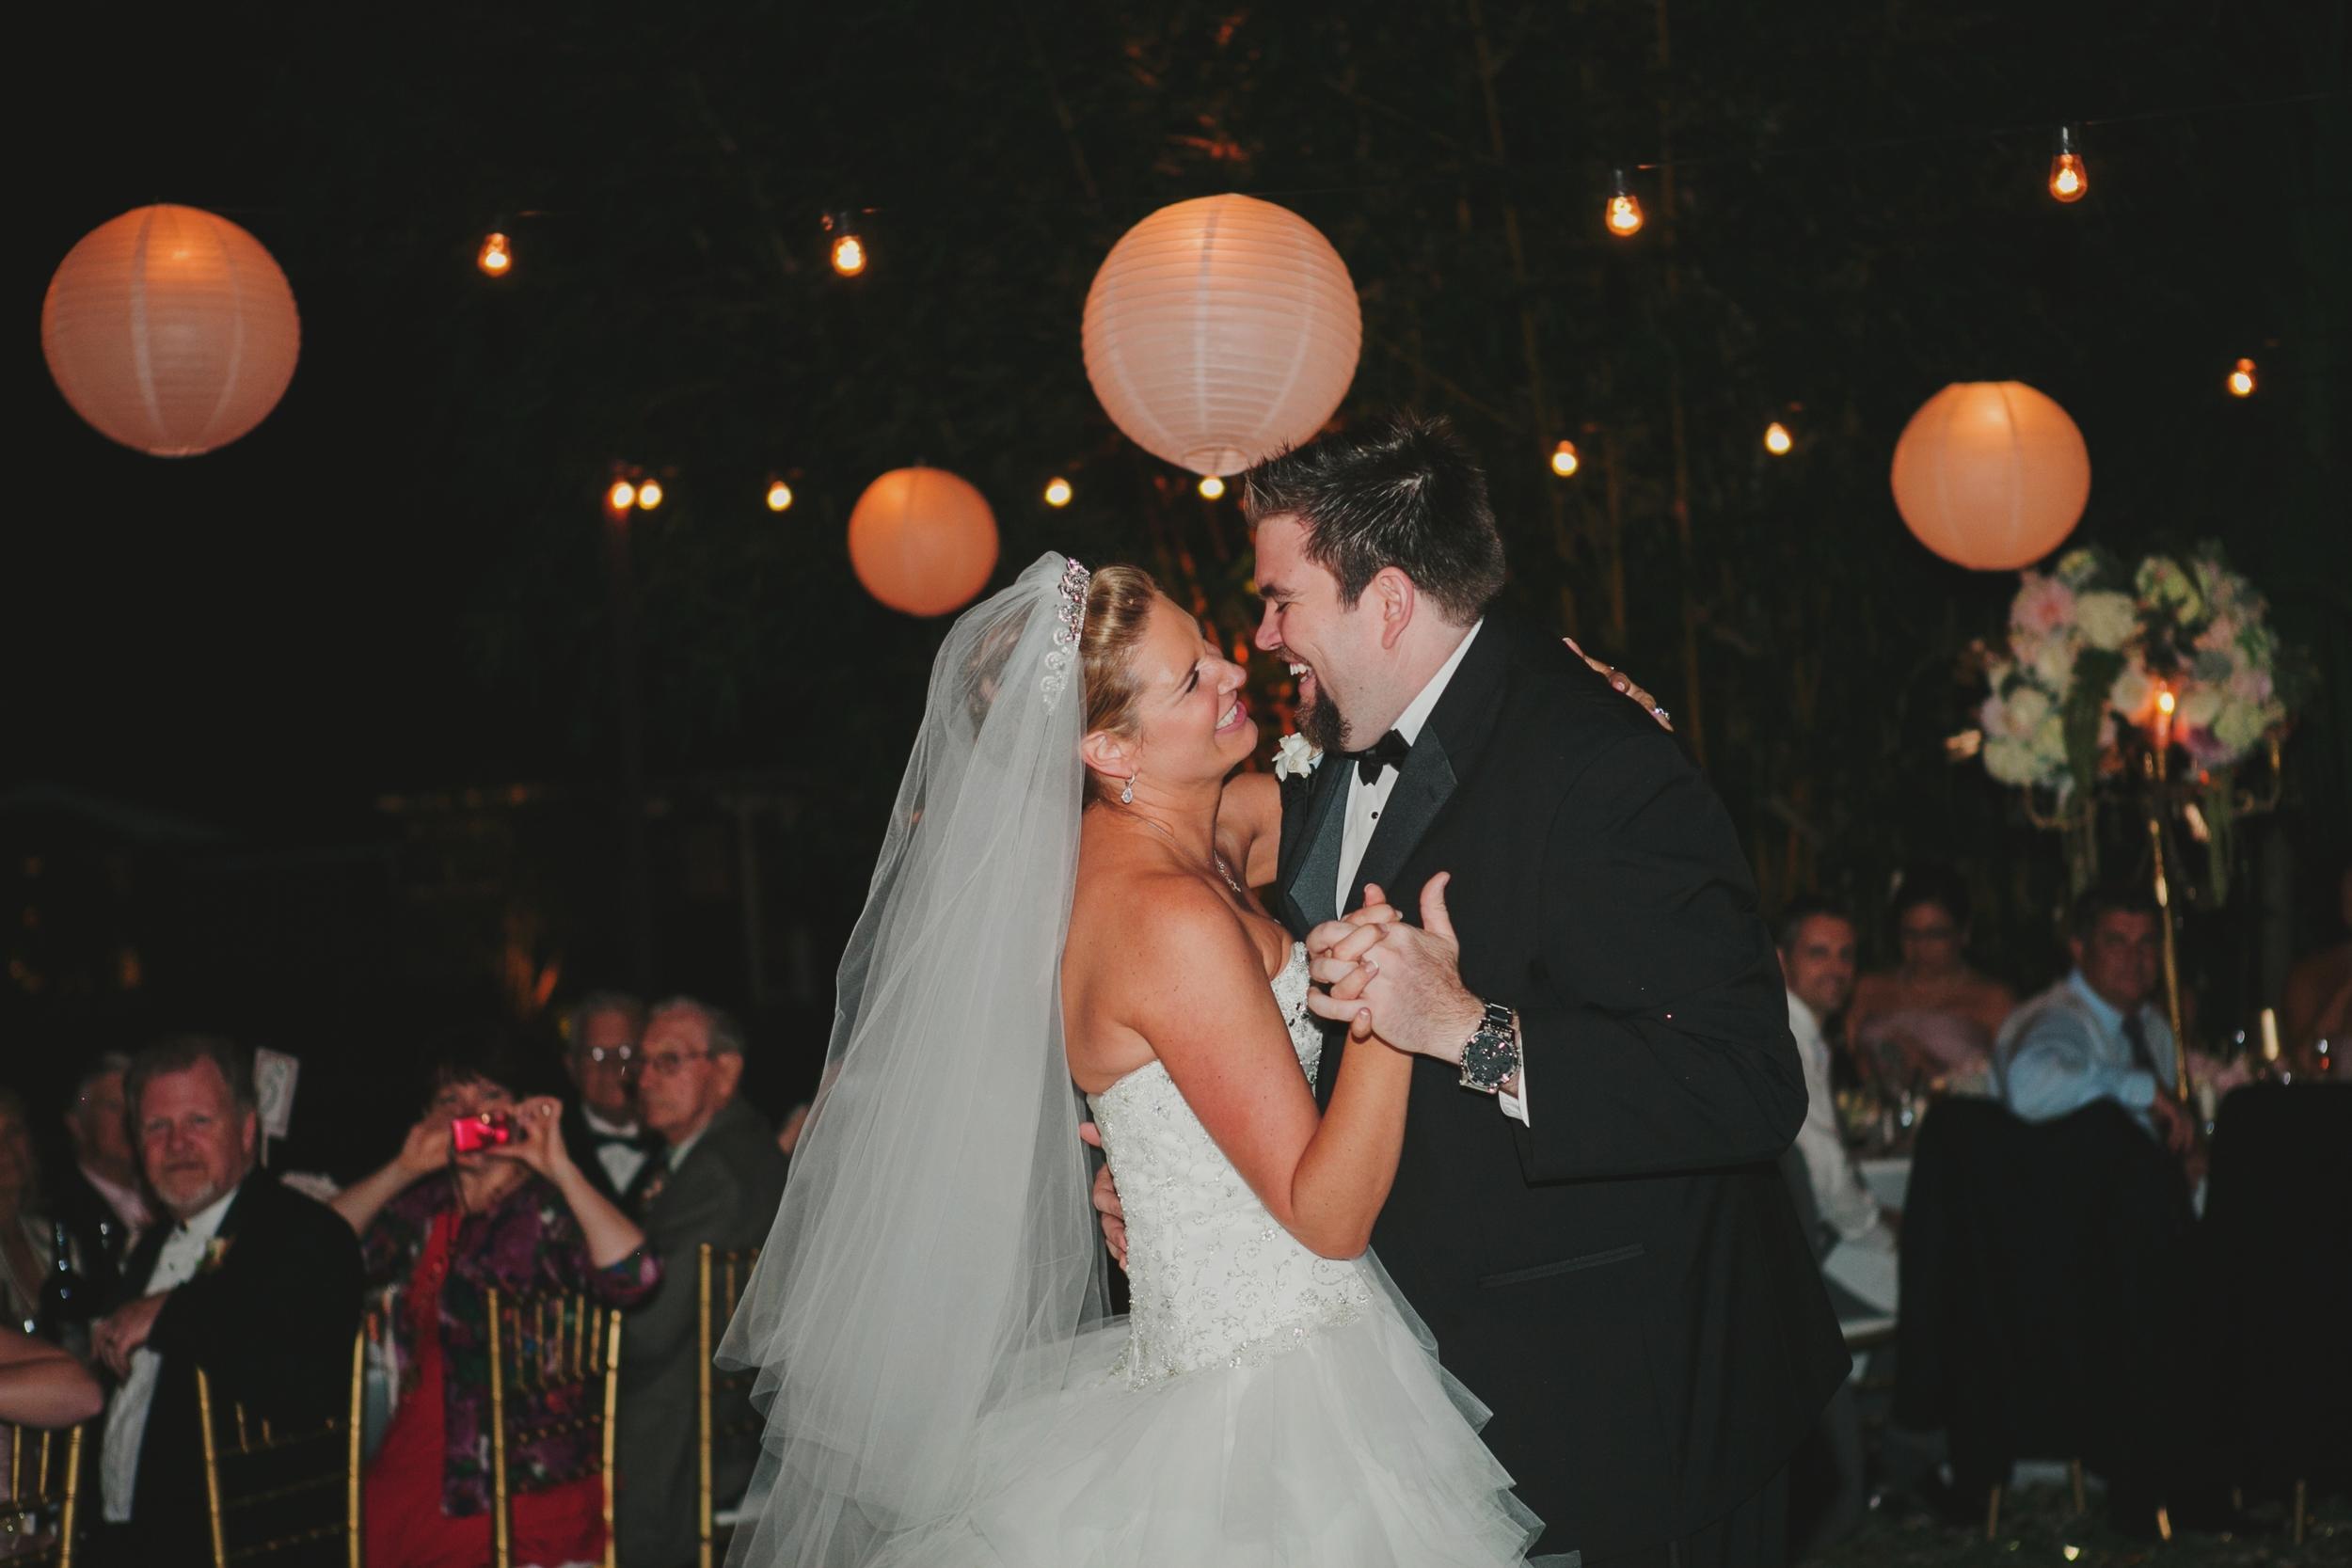 The-Suitcase-Studio-Timree-Matt-Lifestyle-Wedding-Photographer-092.jpg